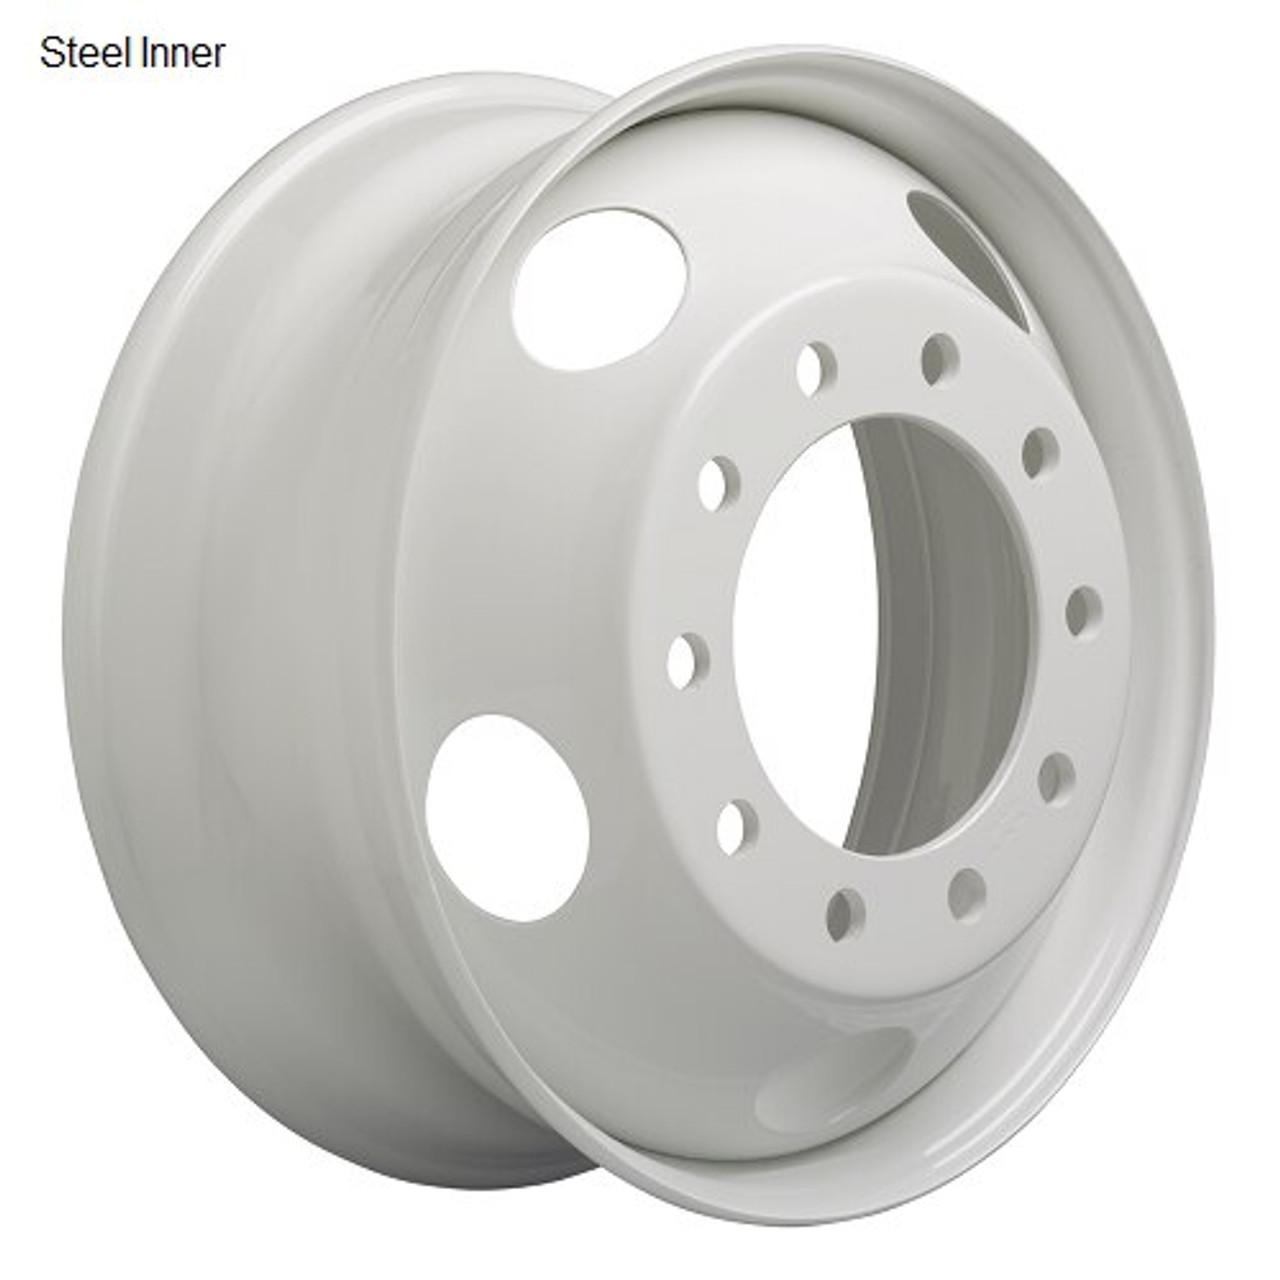 22.5 x 8.25 Accuride Steel